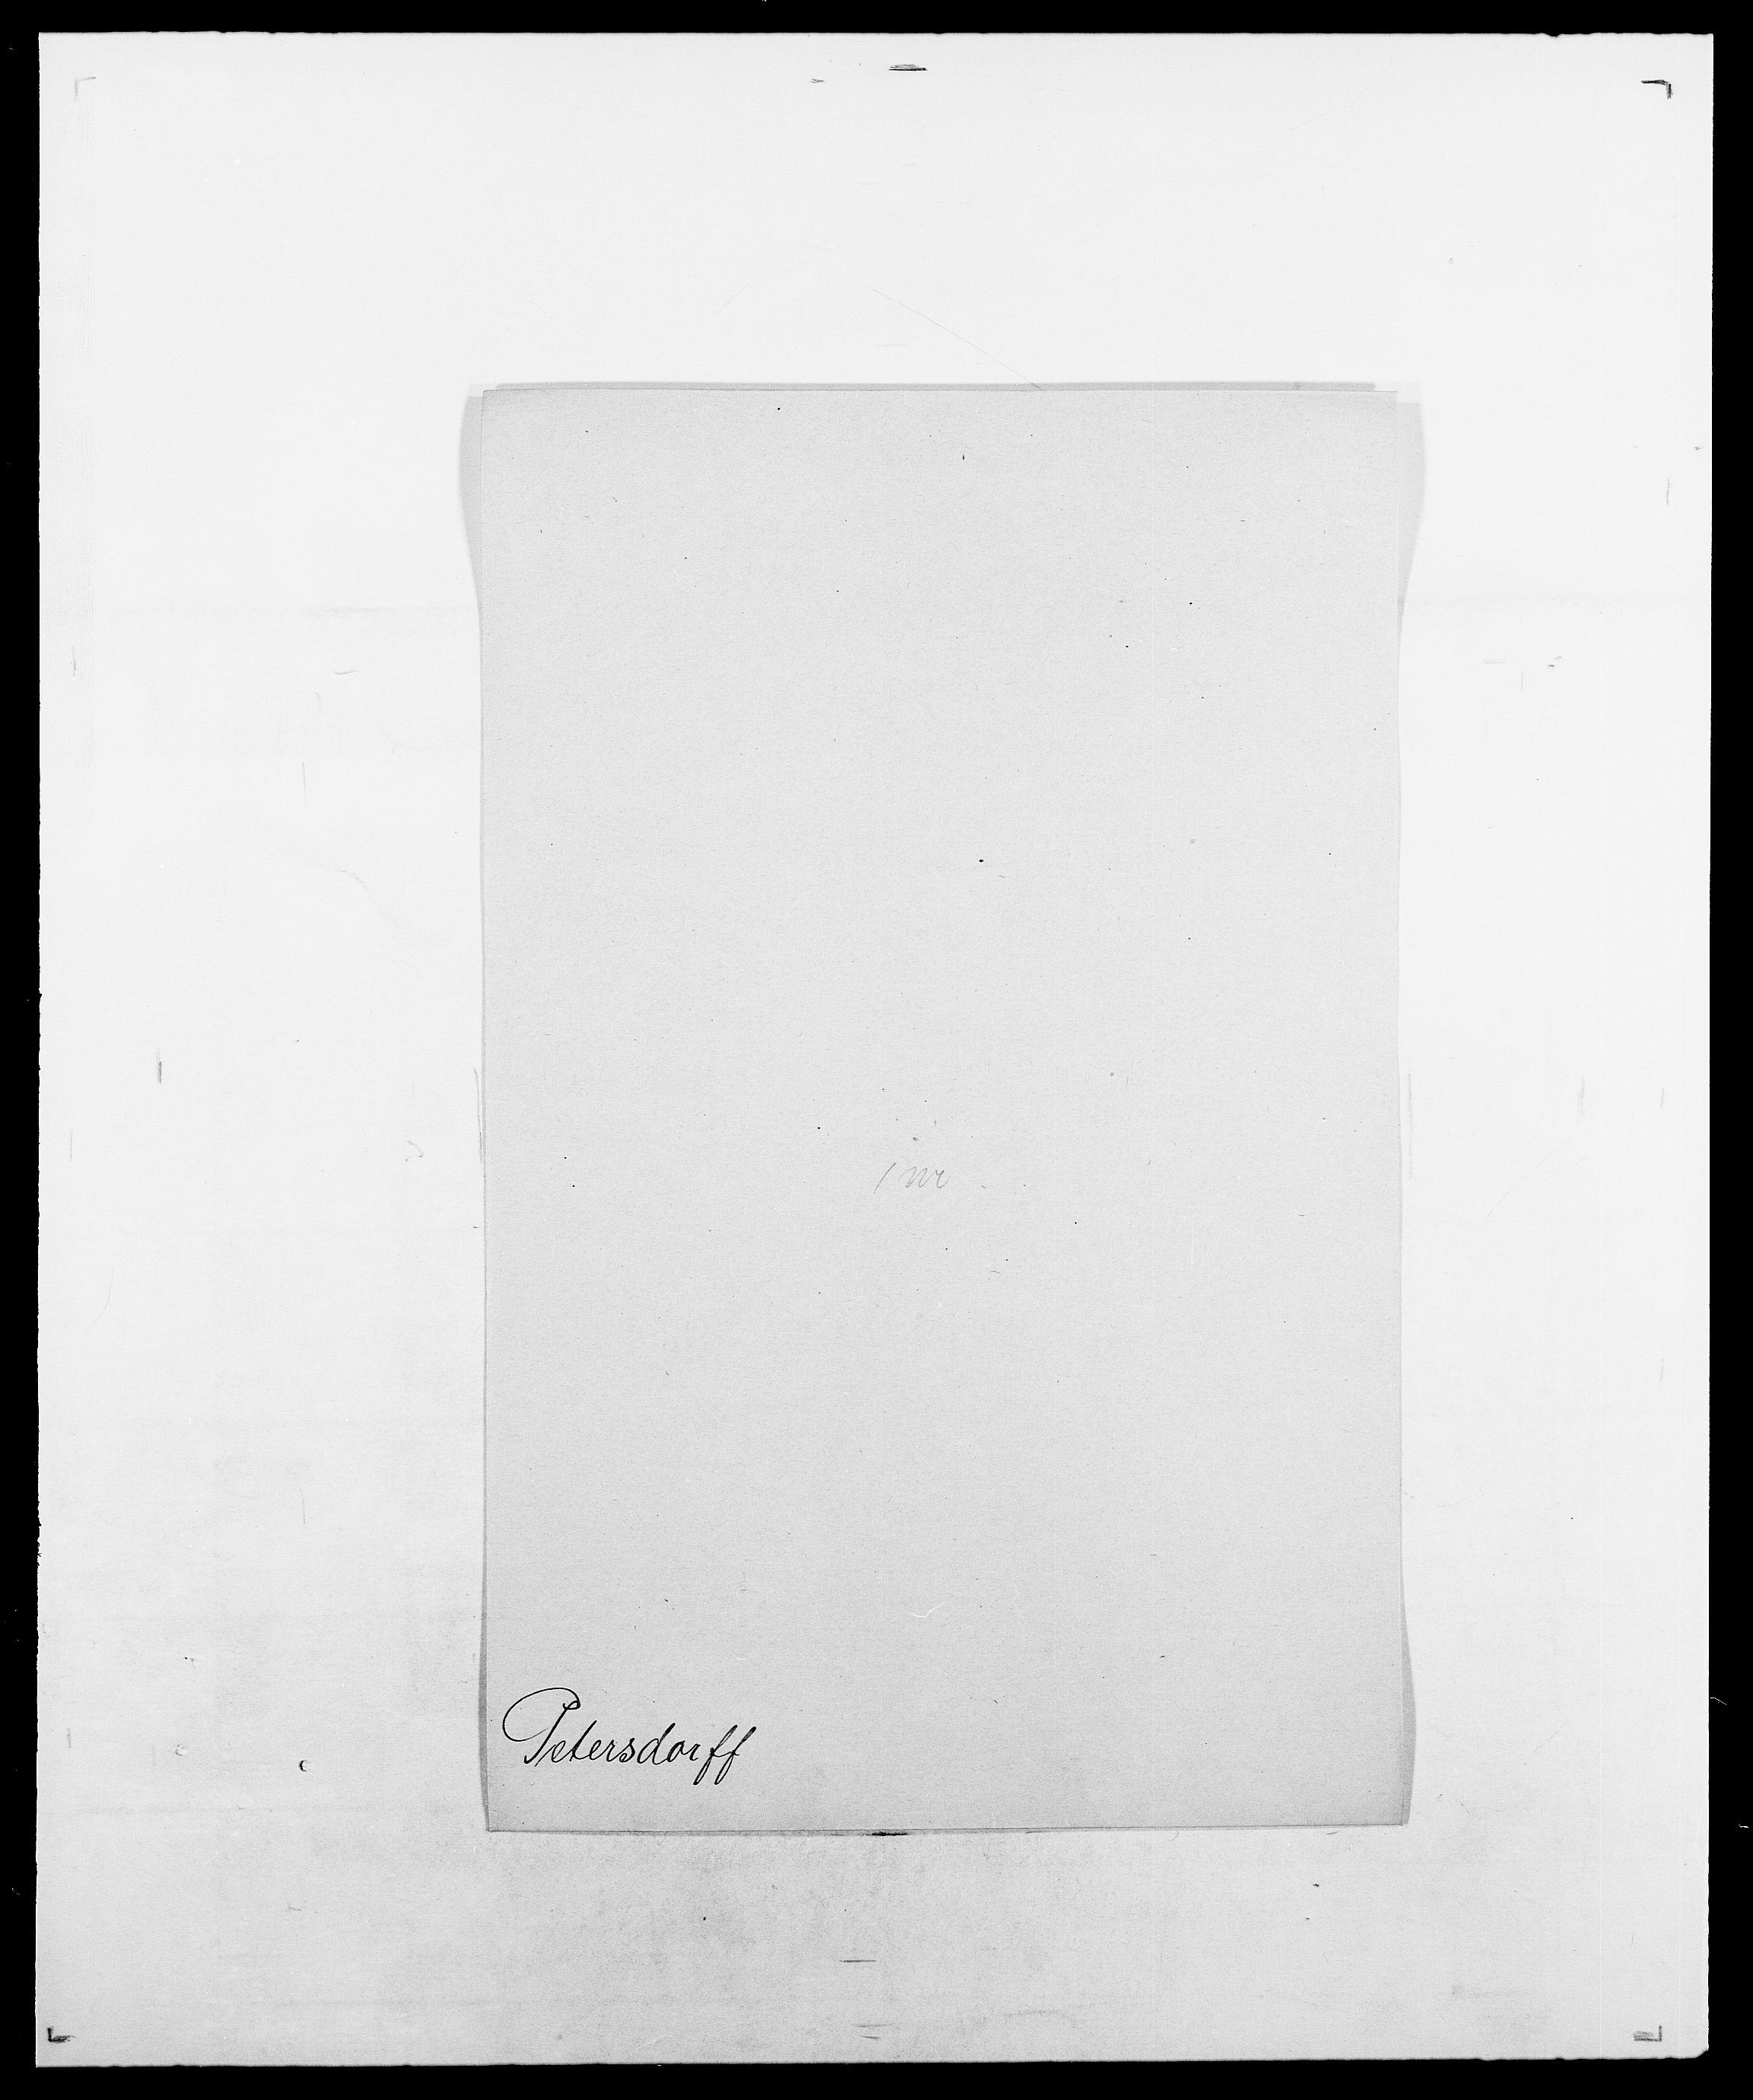 SAO, Delgobe, Charles Antoine - samling, D/Da/L0030: Paars - Pittelkov, s. 384